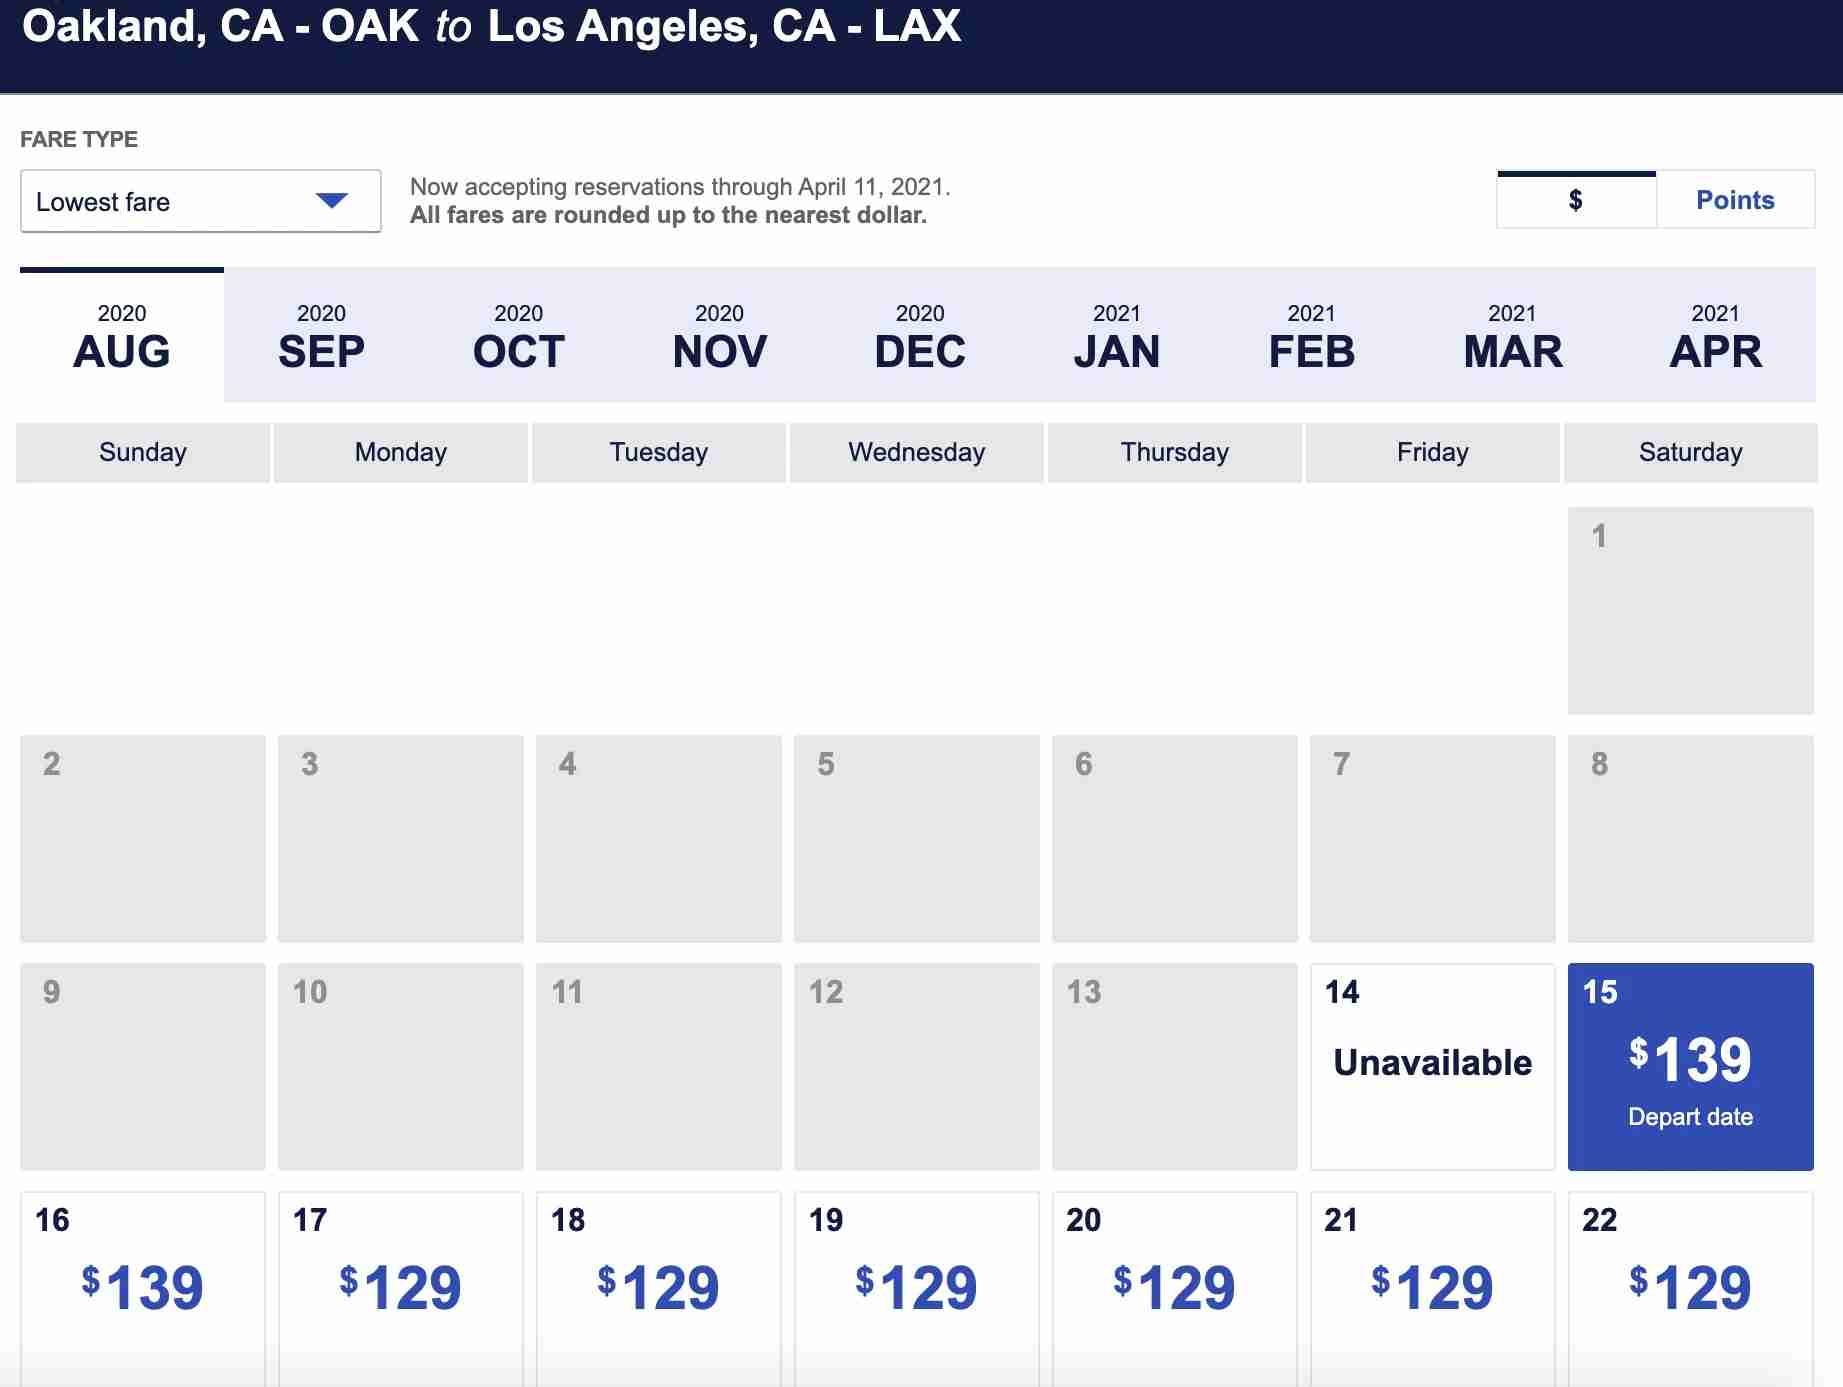 Southwest last-minute fare OAK-LAX